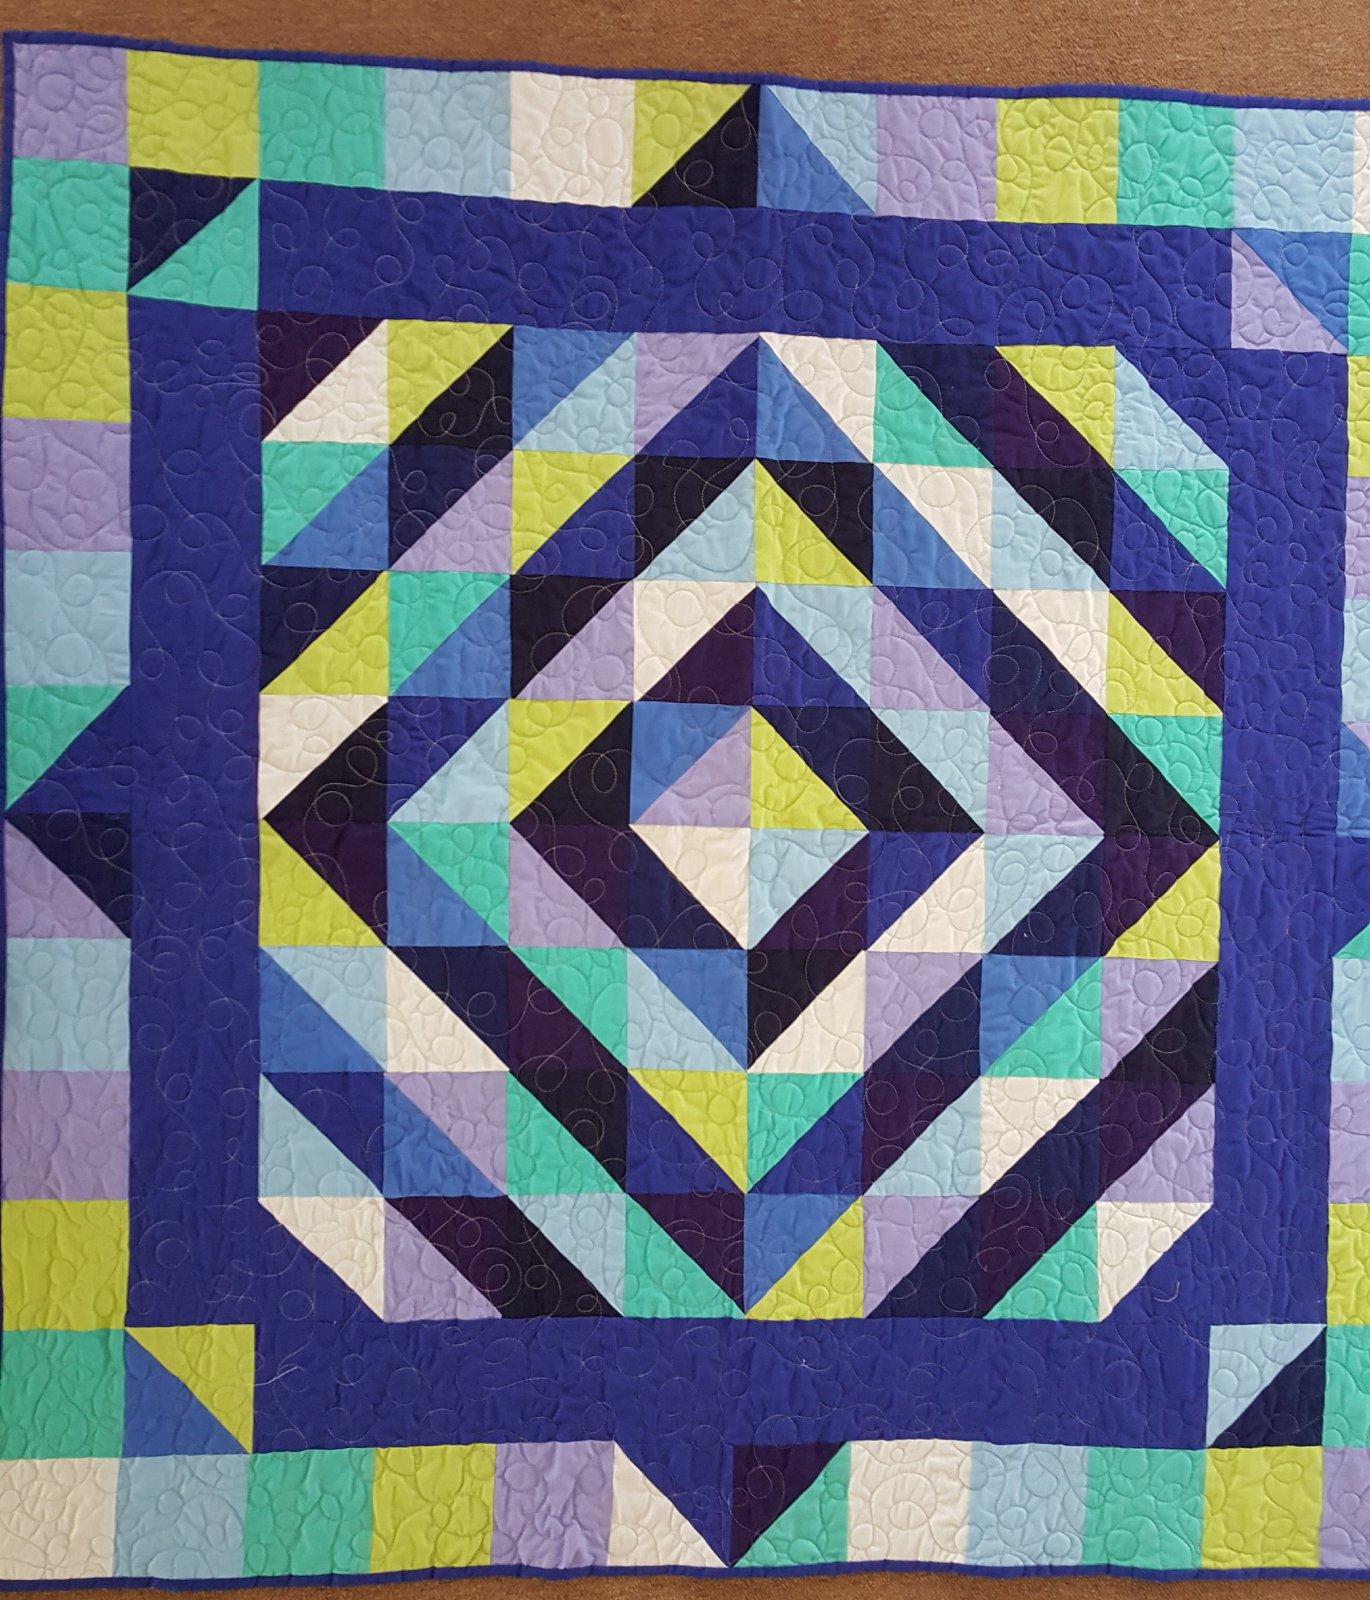 Study in Blue Lap Quilt